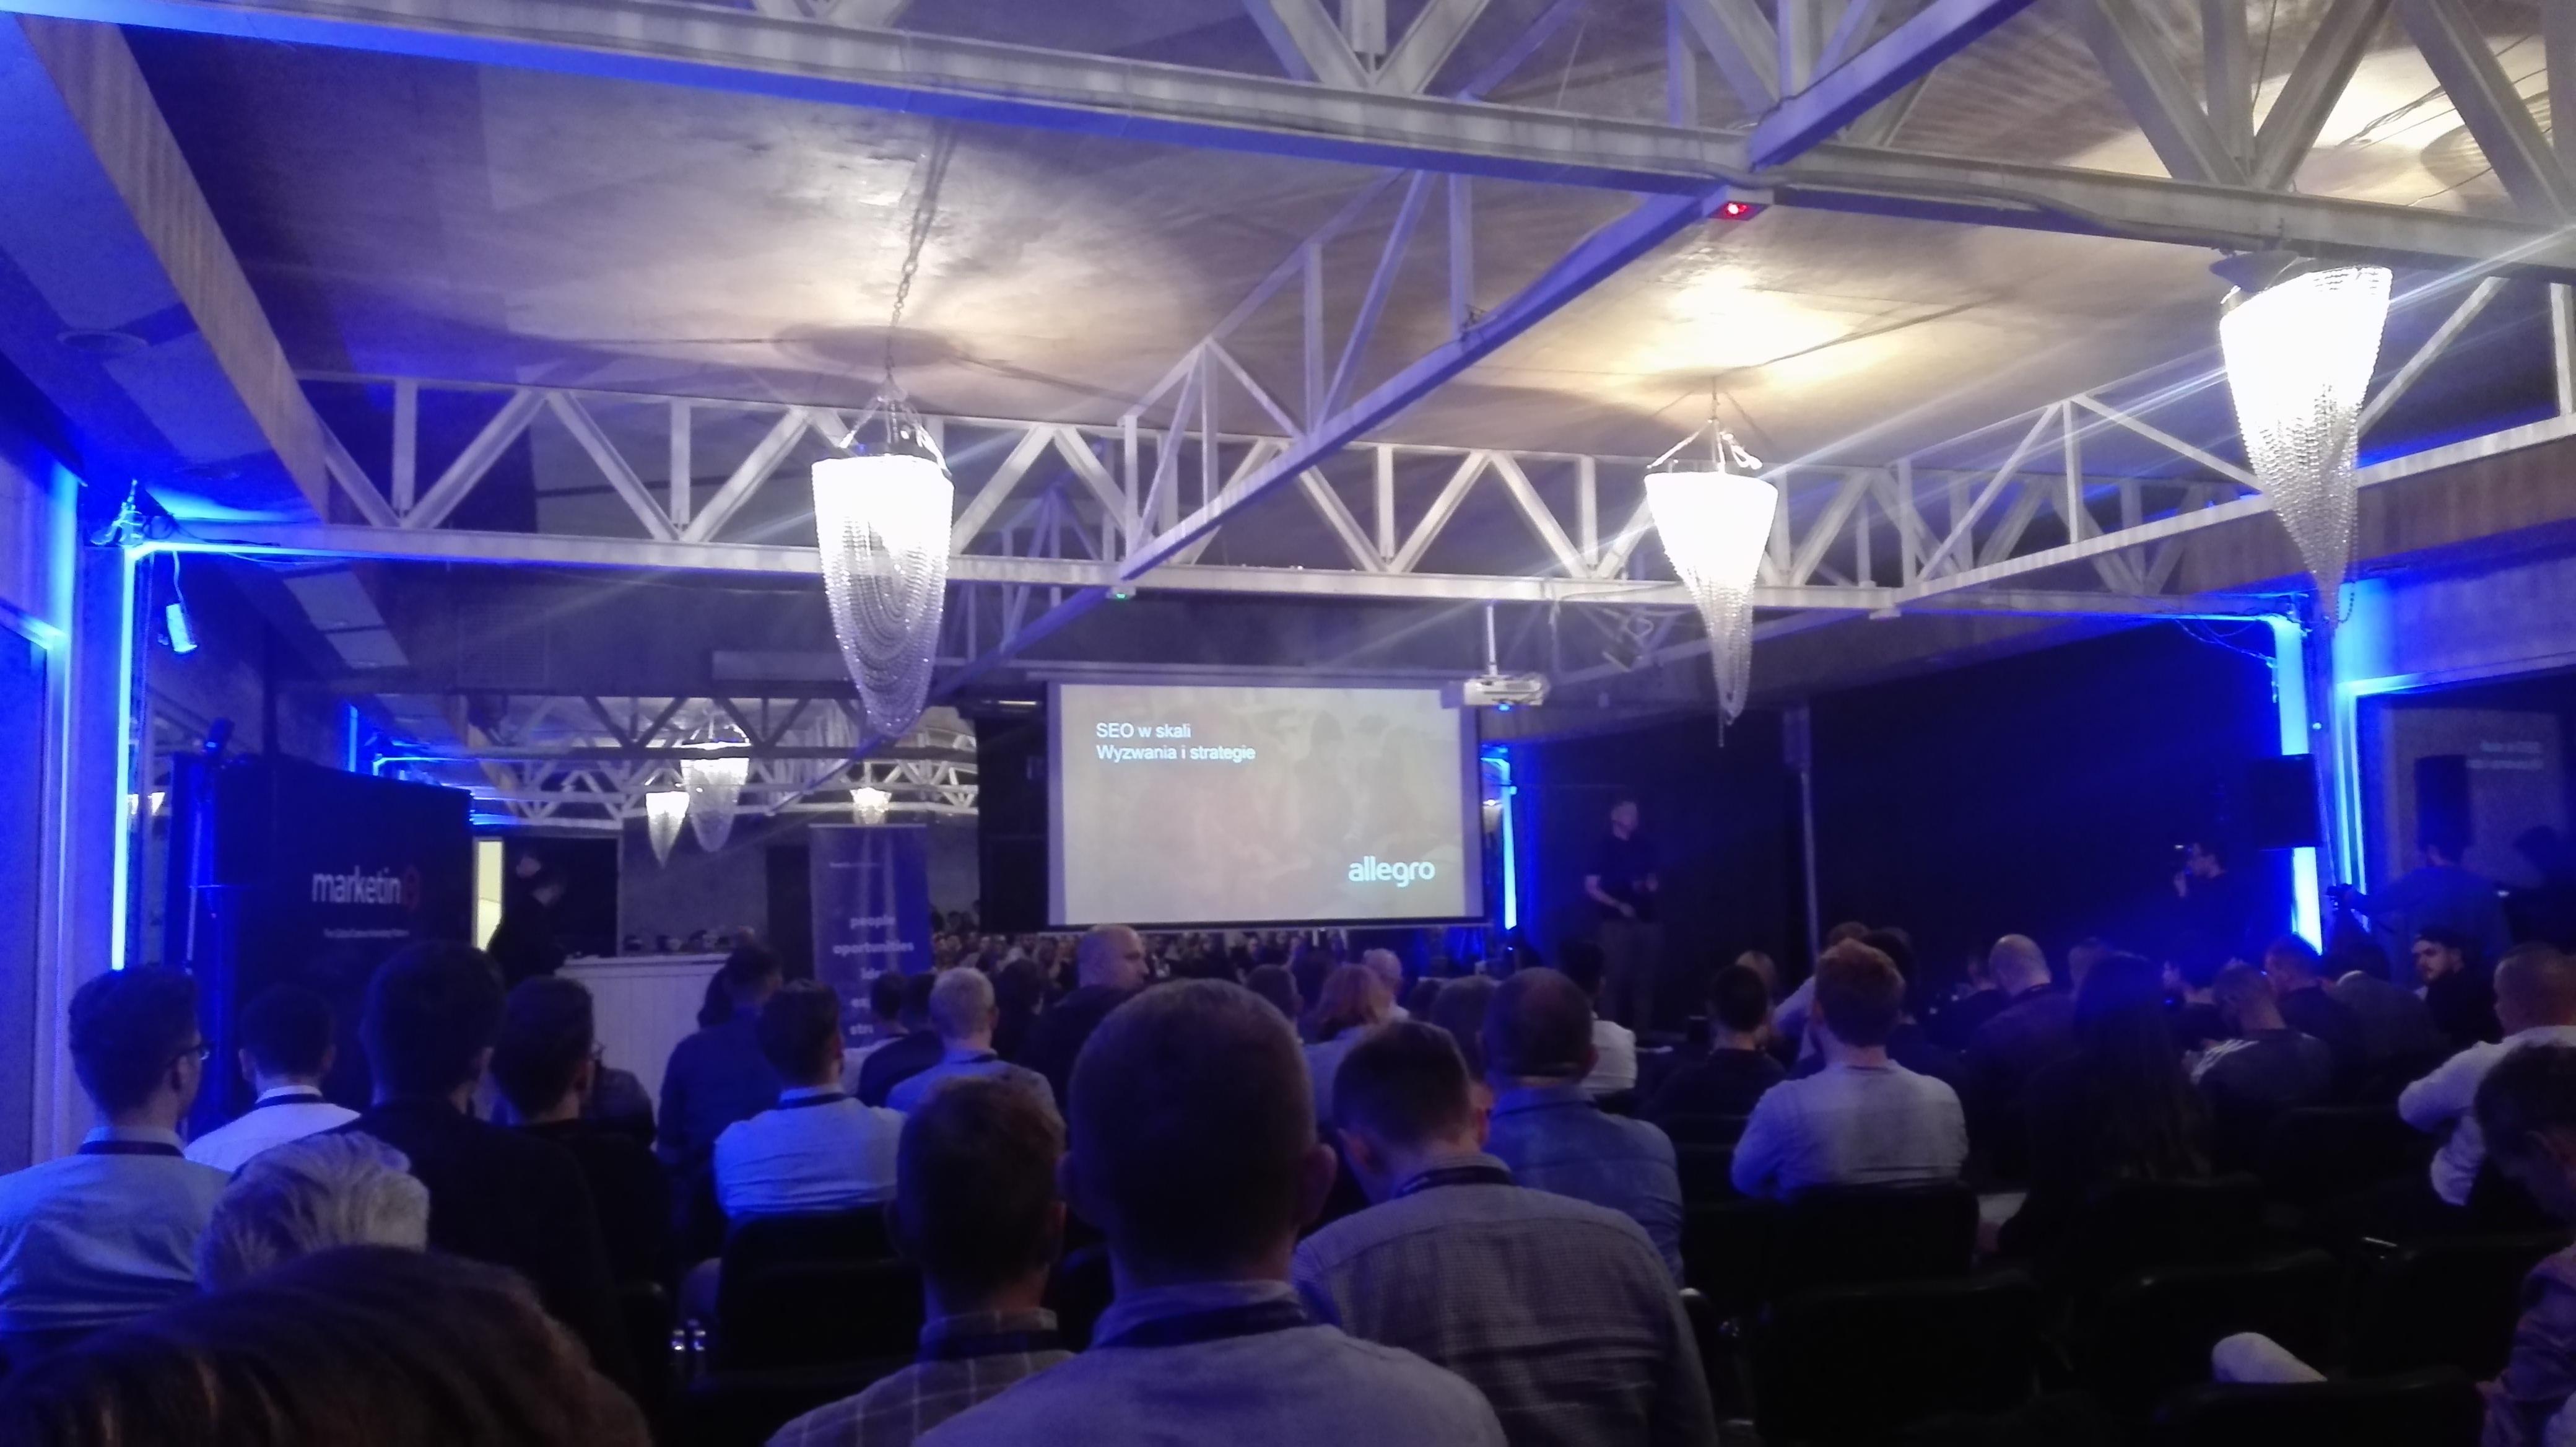 Search.conference – Relacja z nowej konferencji